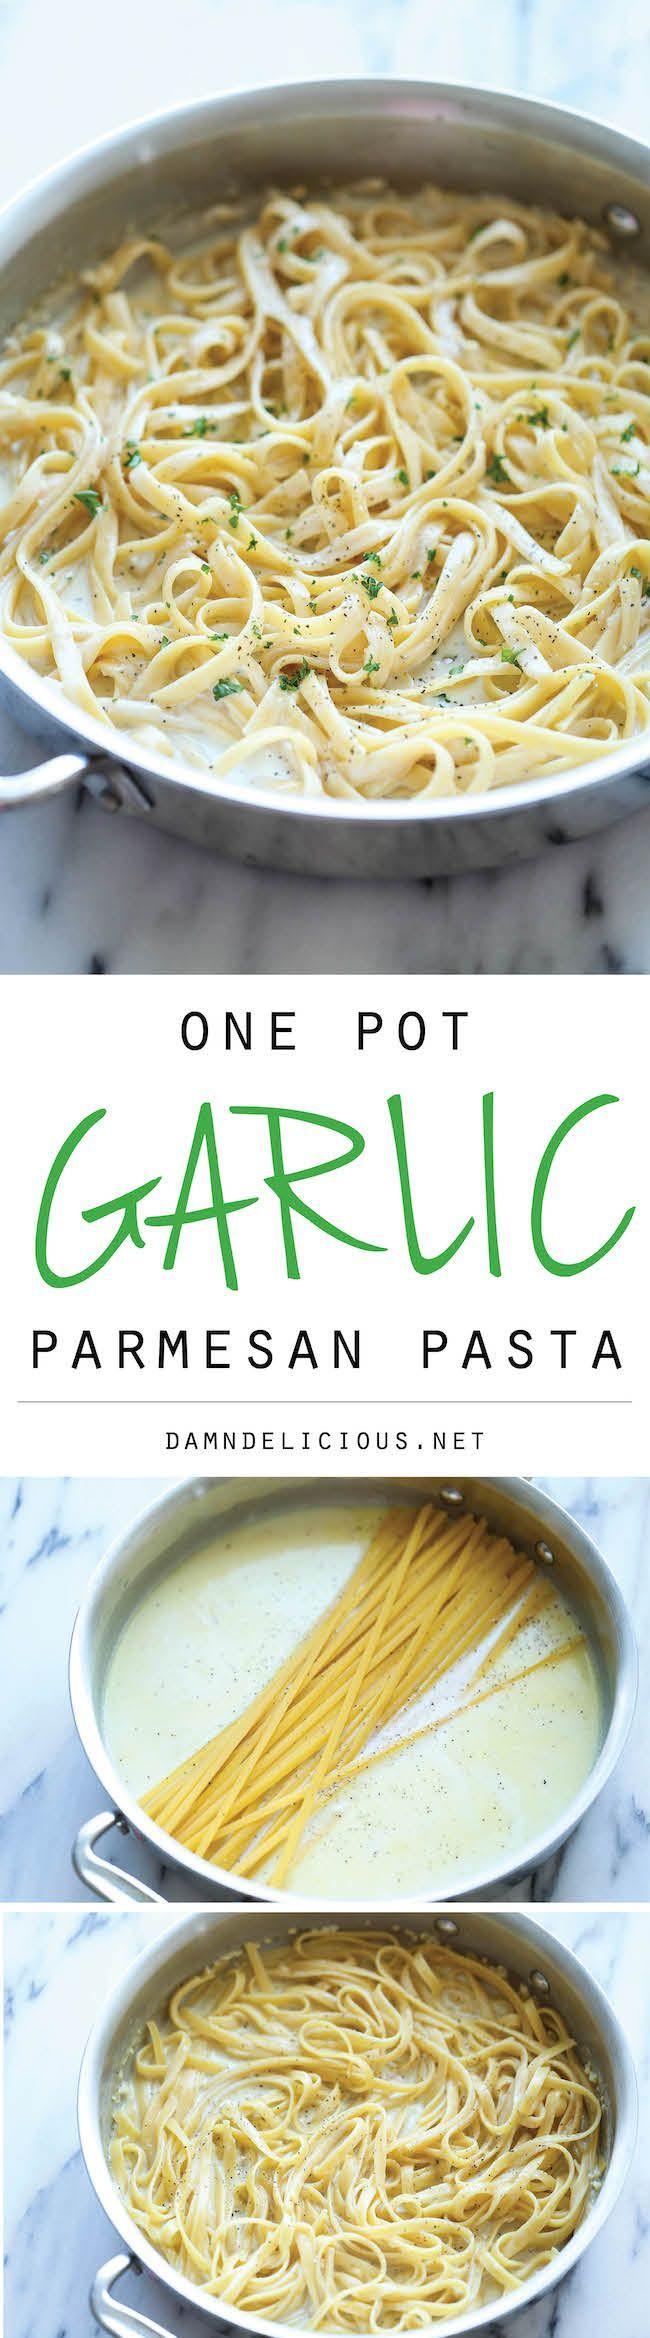 #bestpastarecipes #onepot #garlicparmesanpasta